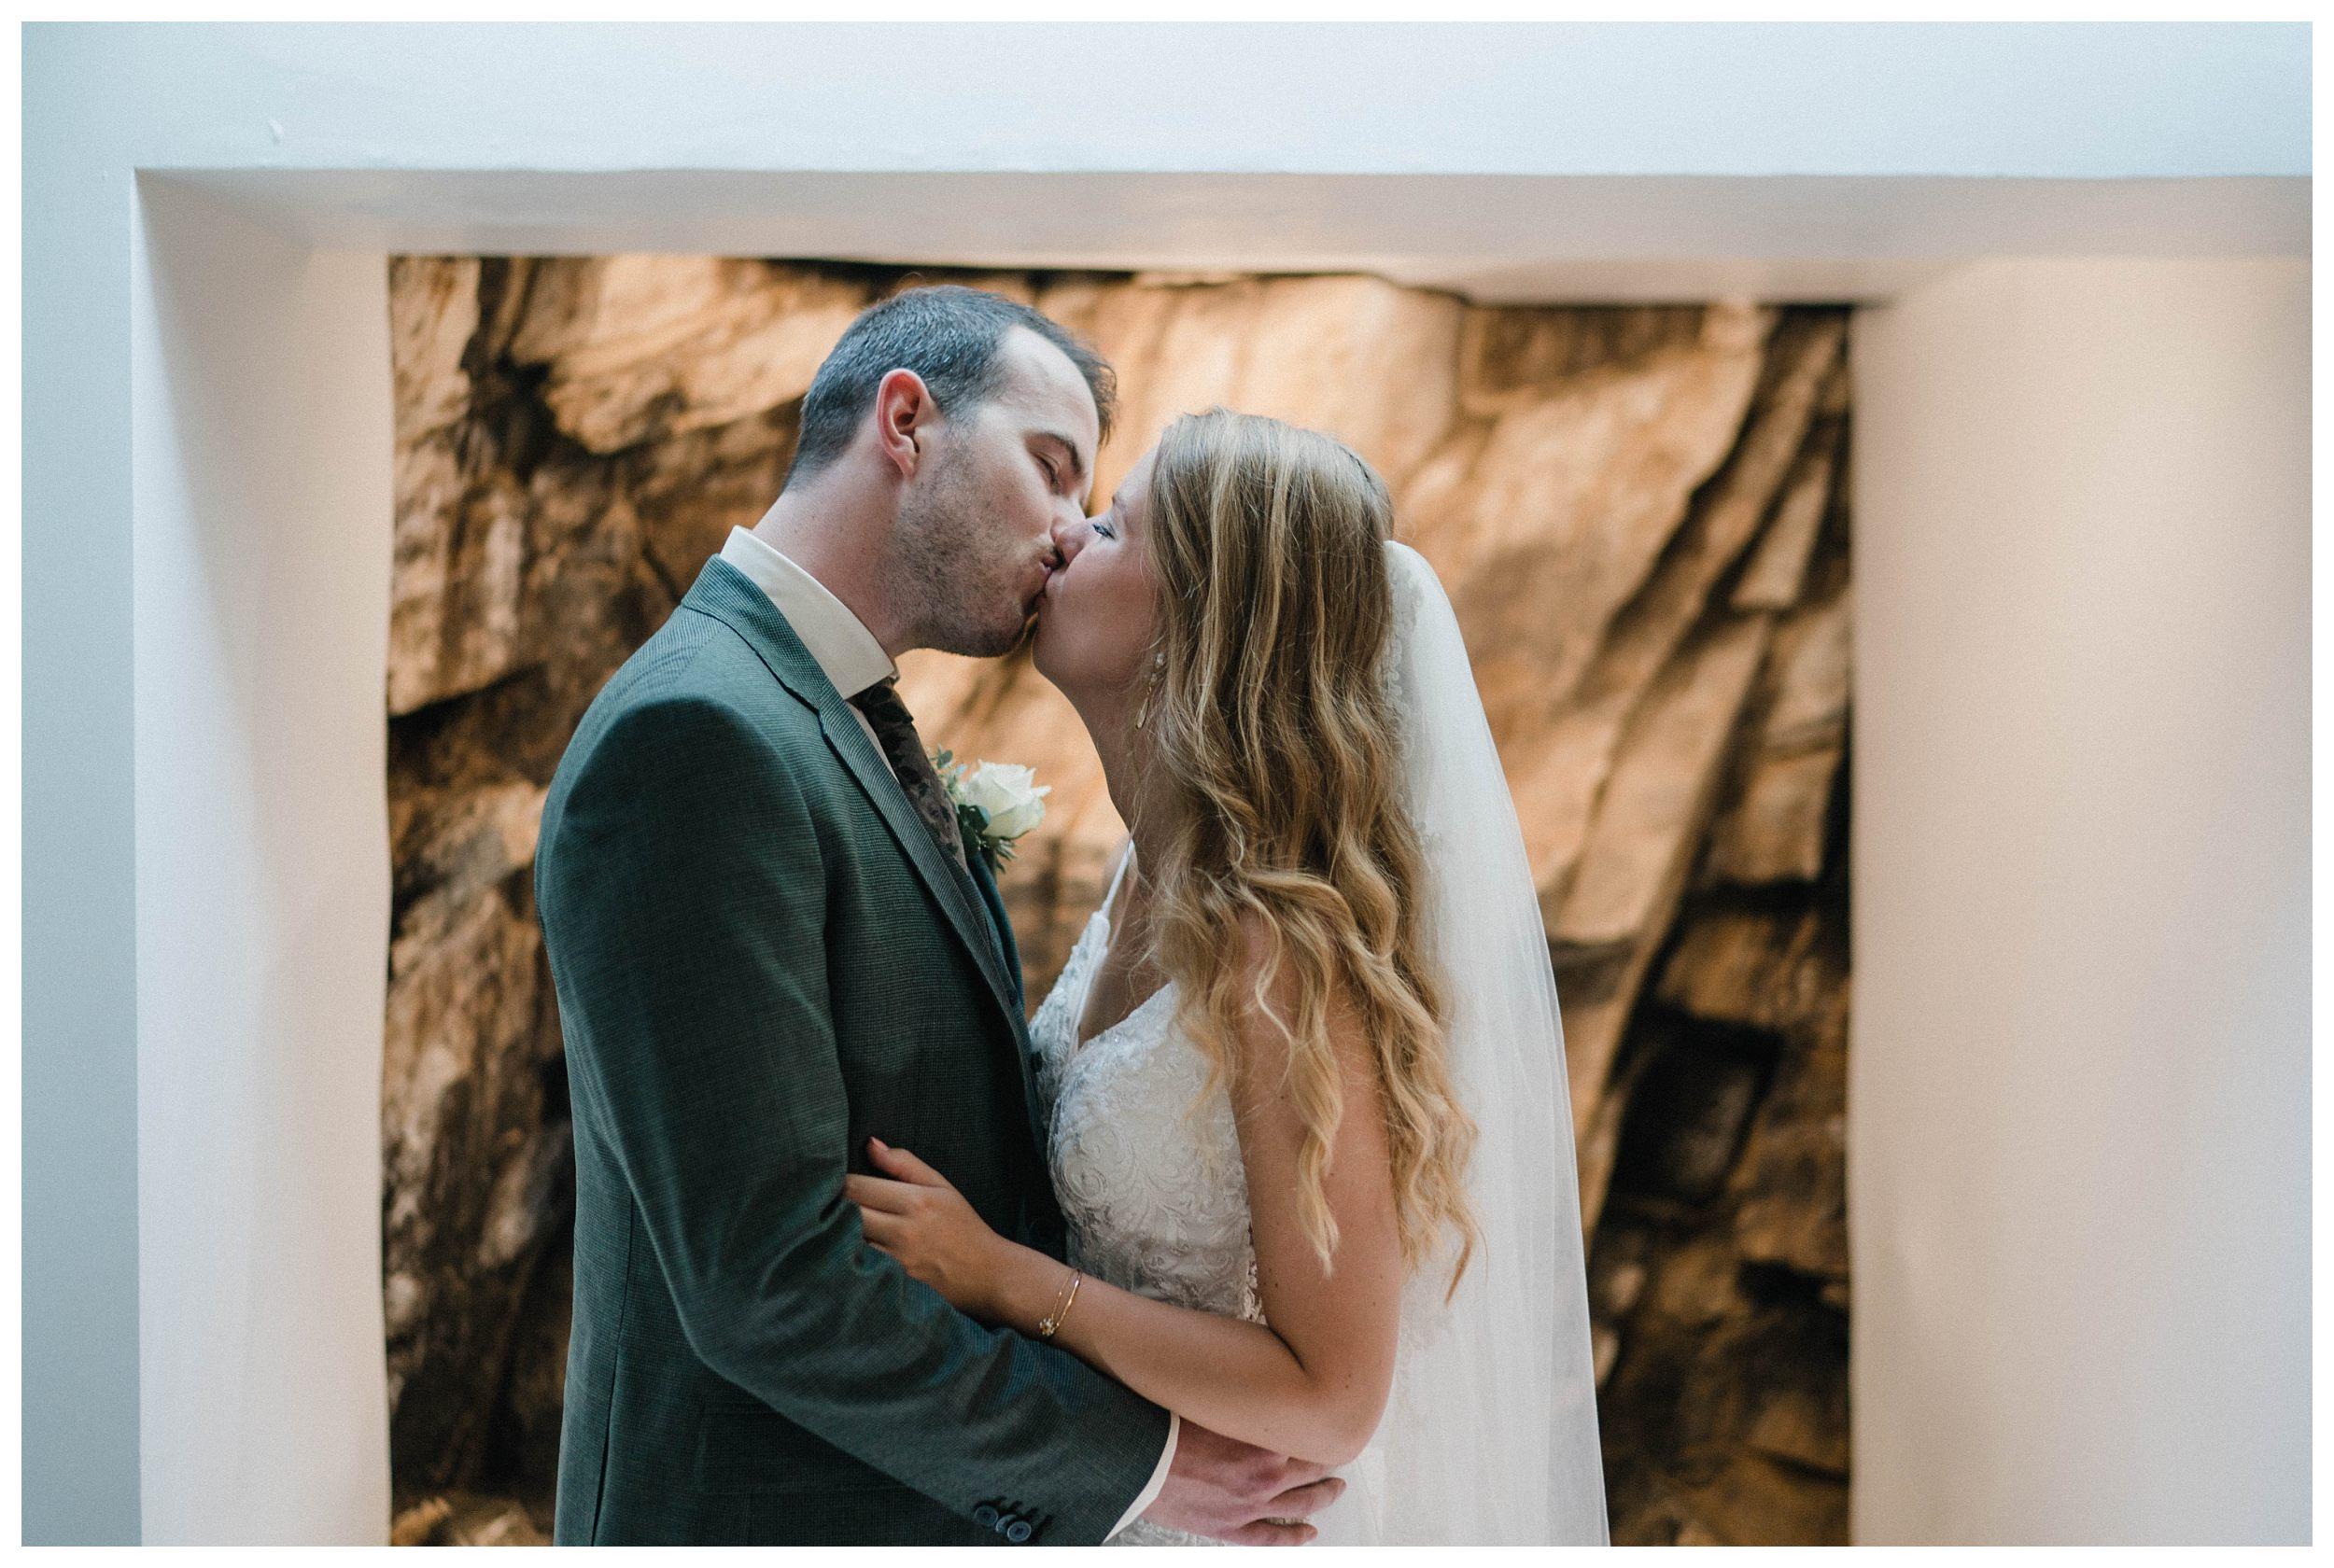 huwelijksfotograaf bruidsfotograaf destinationwedding huwelijksfotografie in ardennen nederland (29).jpg